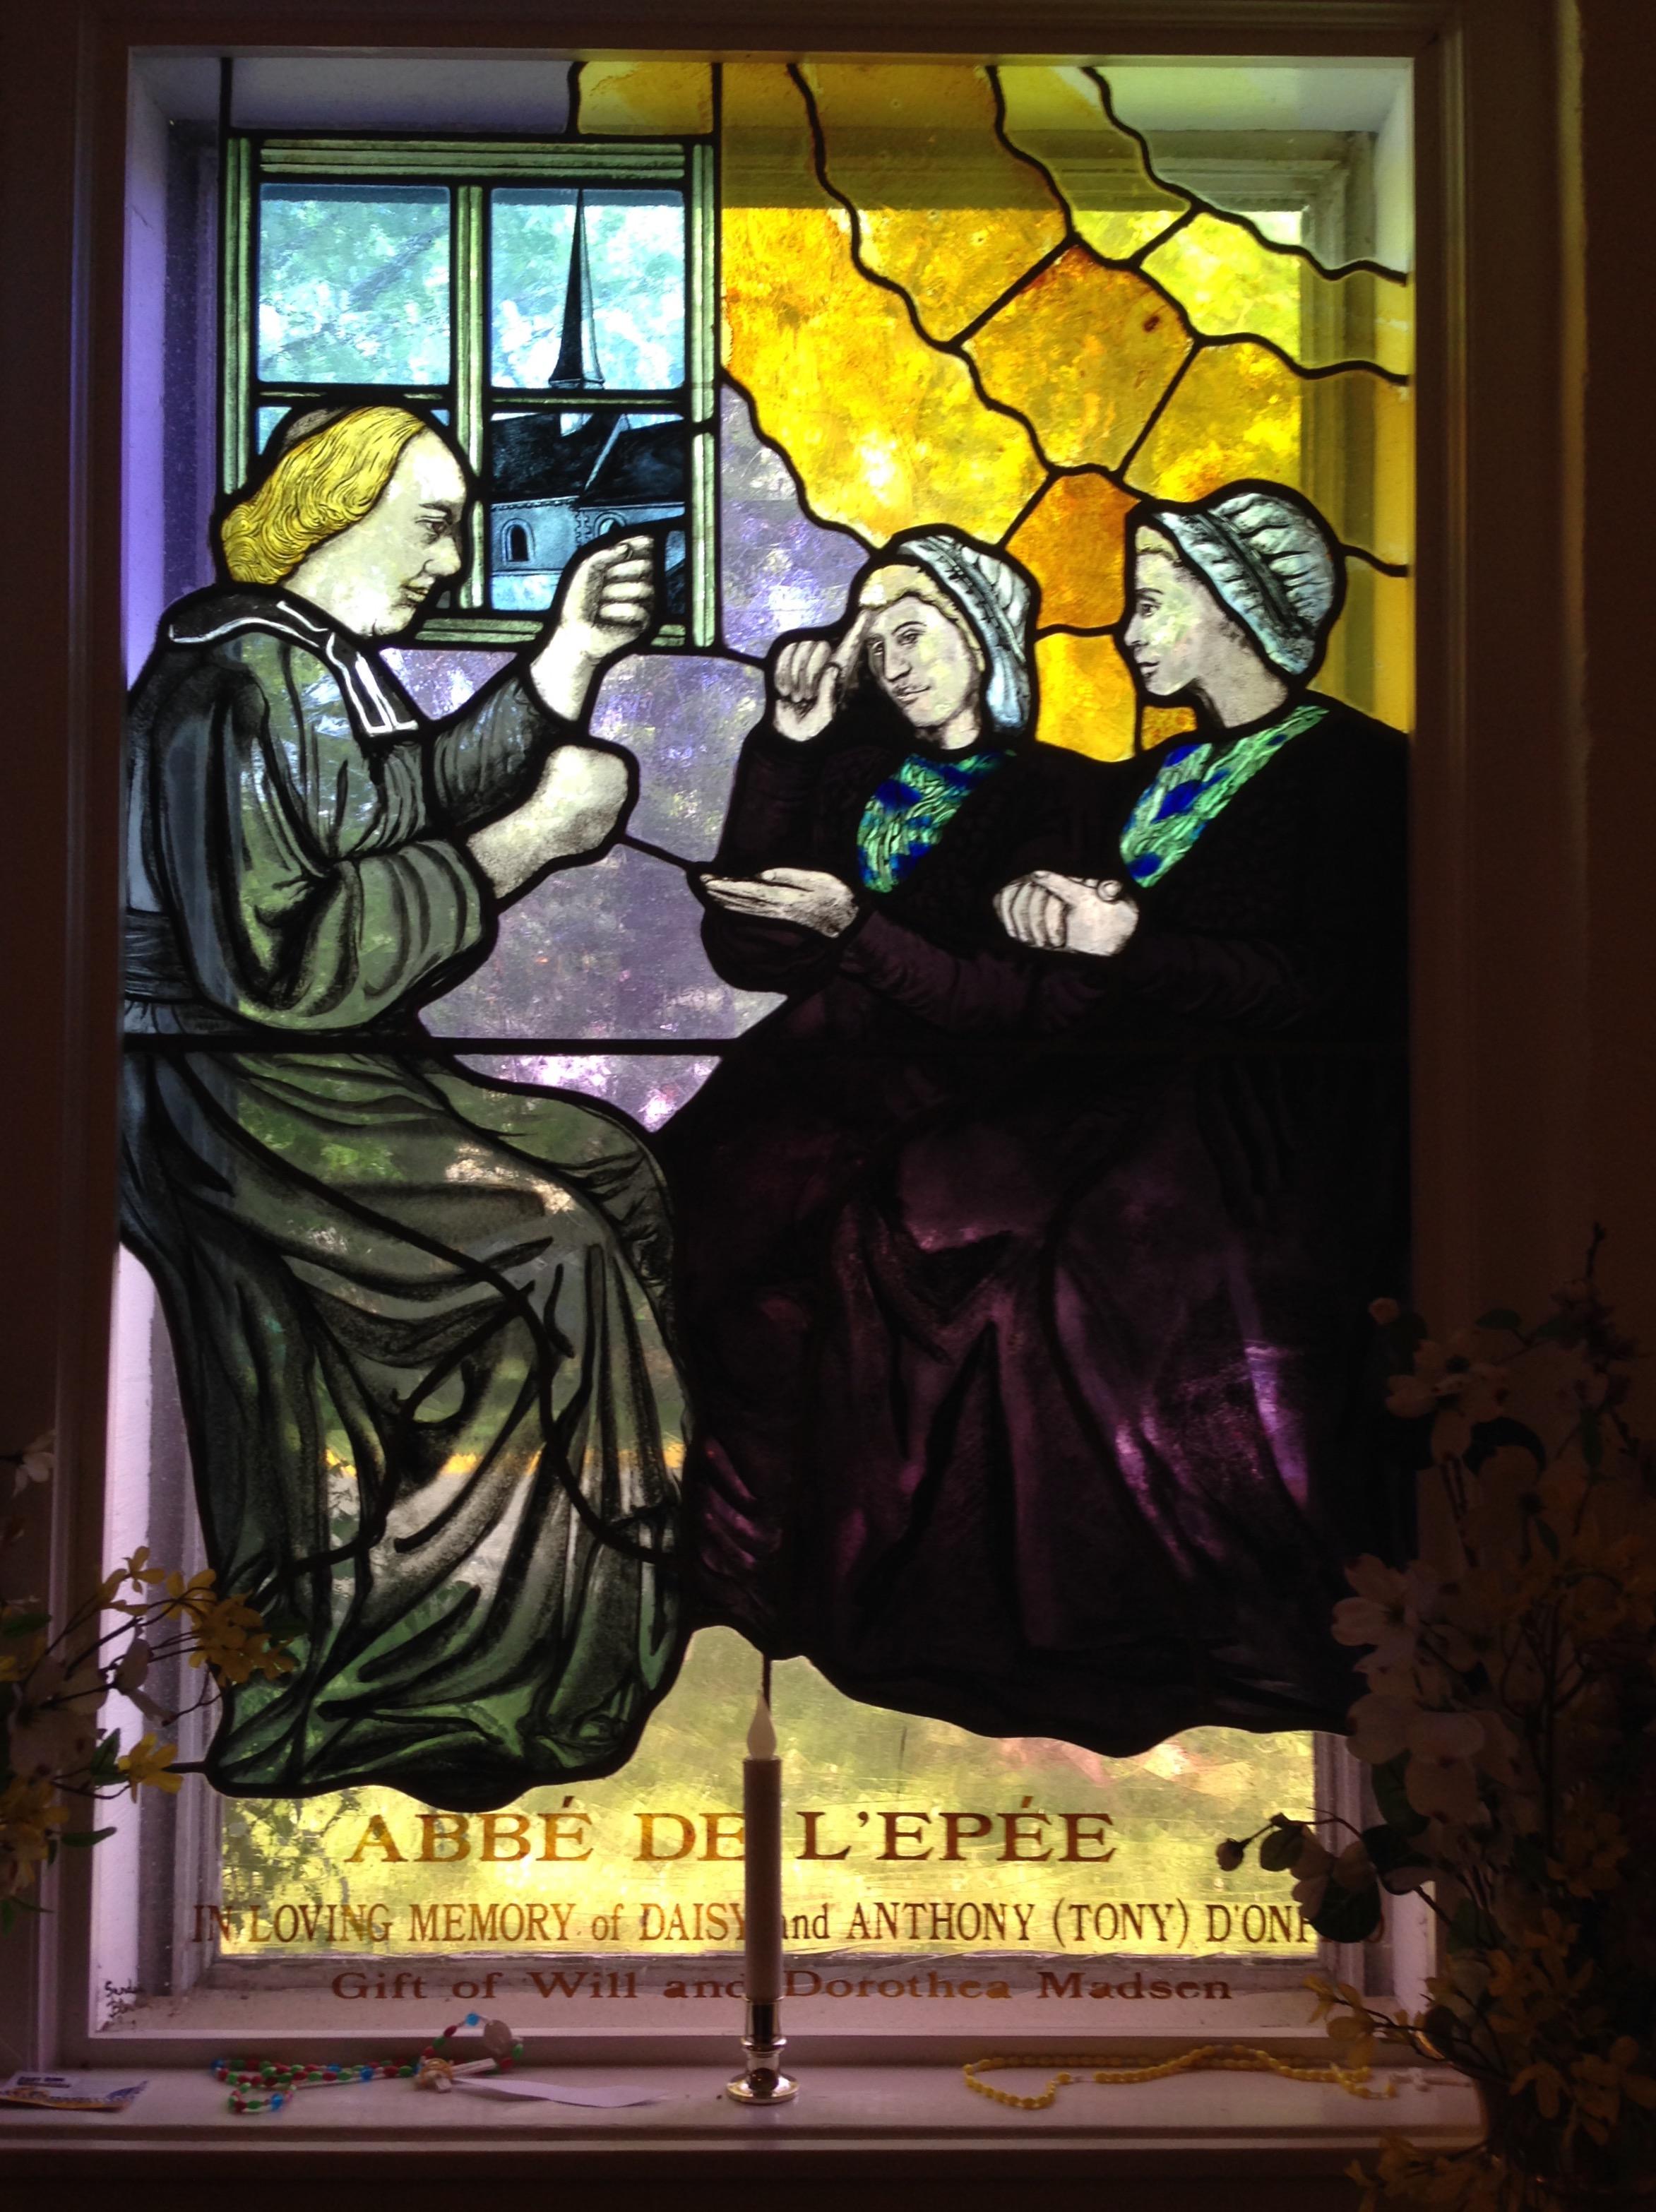 L'epee window